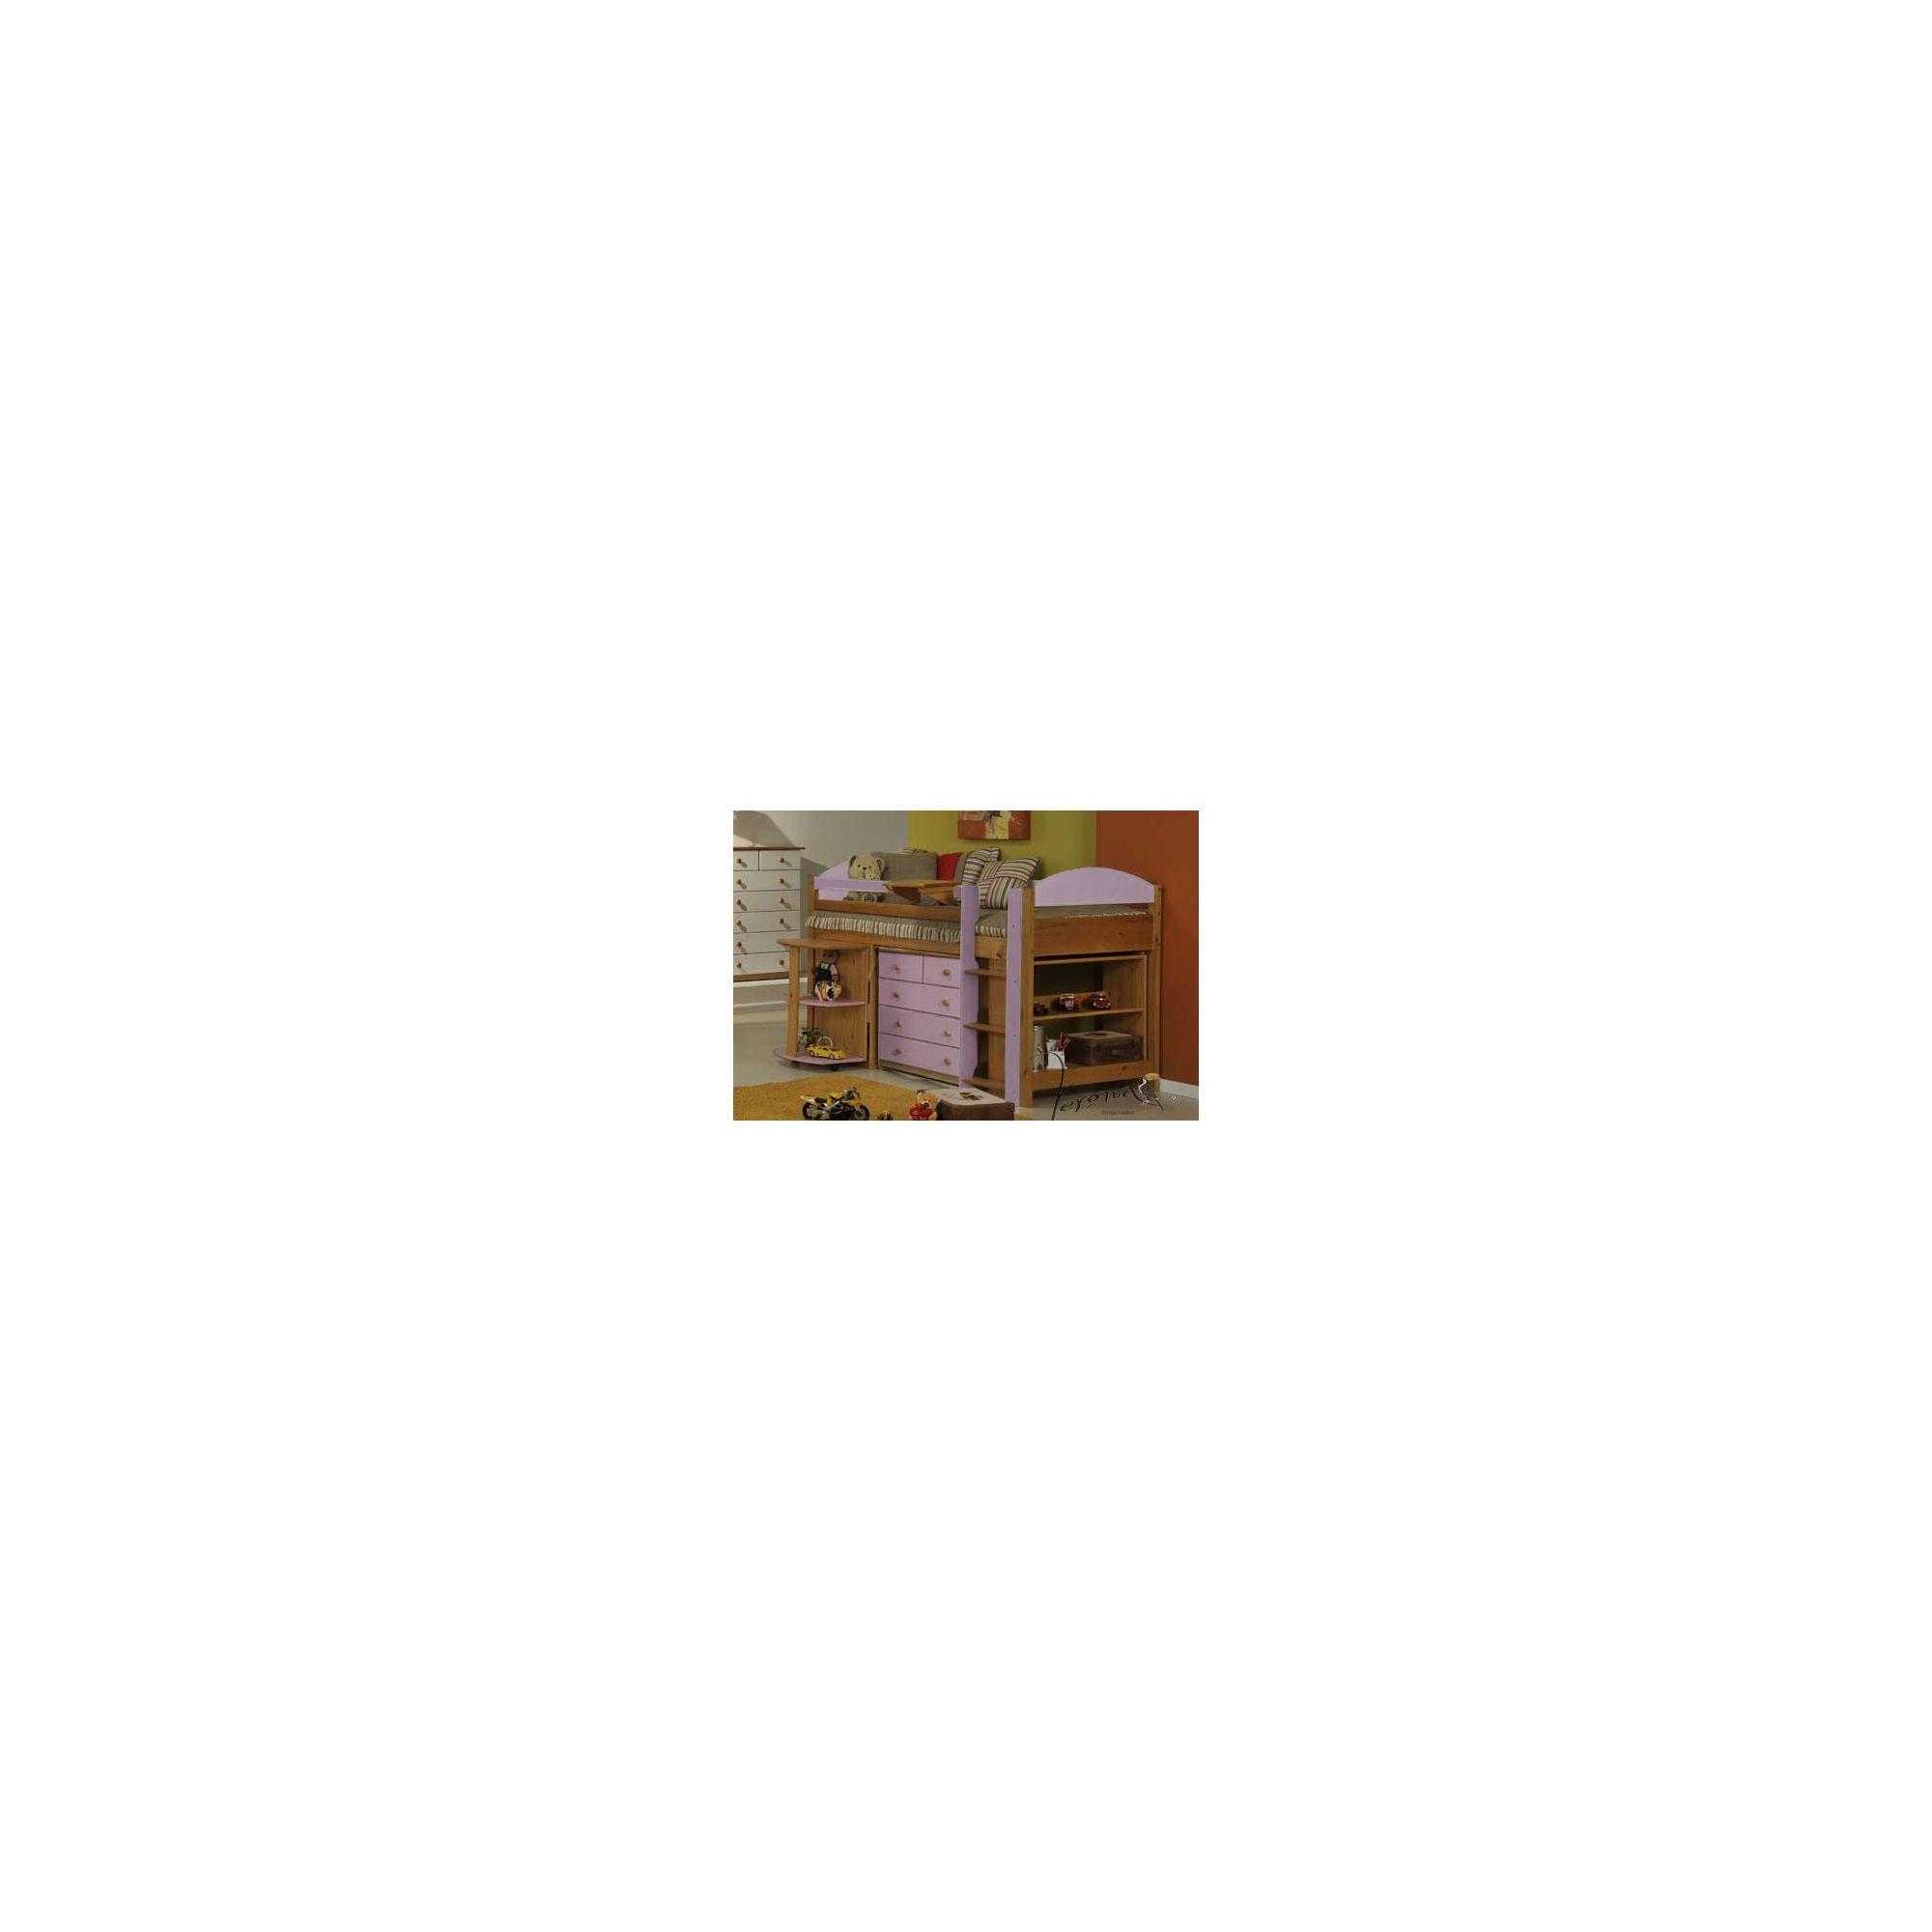 Verona Maximus Midsleeper Bed Frame - Pink at Tesco Direct